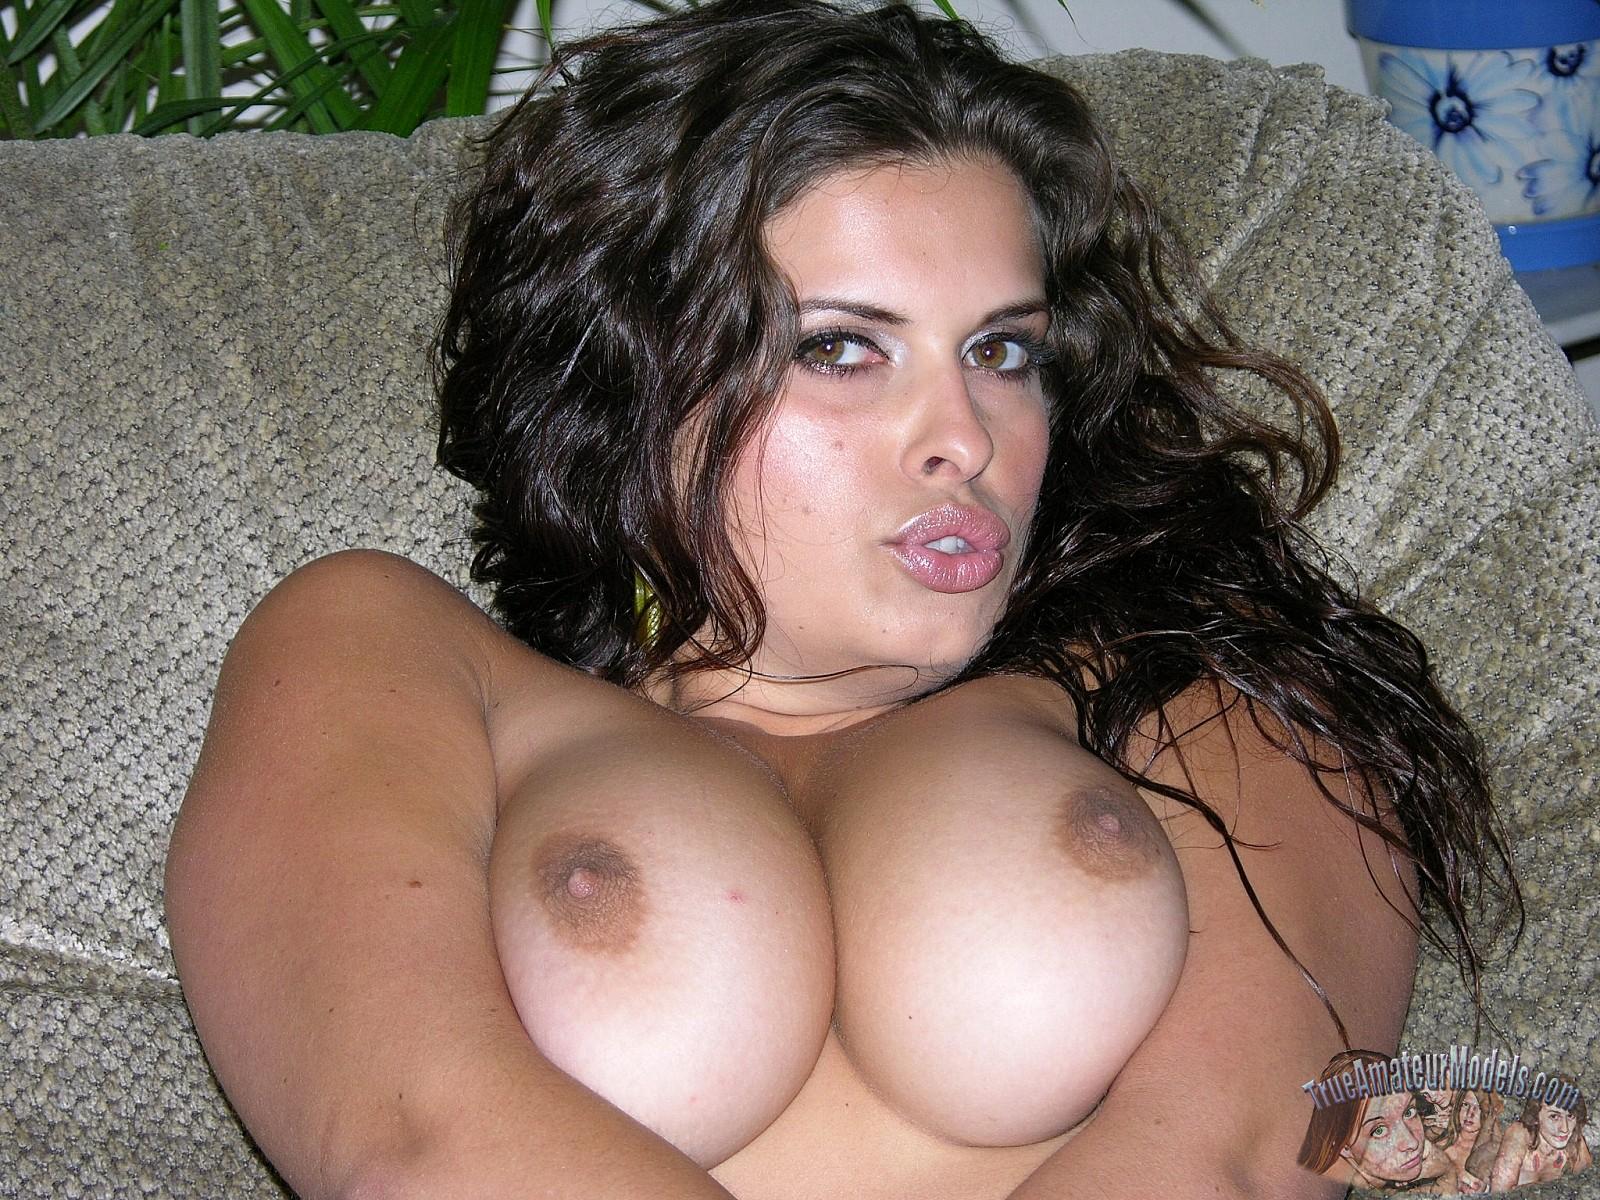 Female stripper exposed